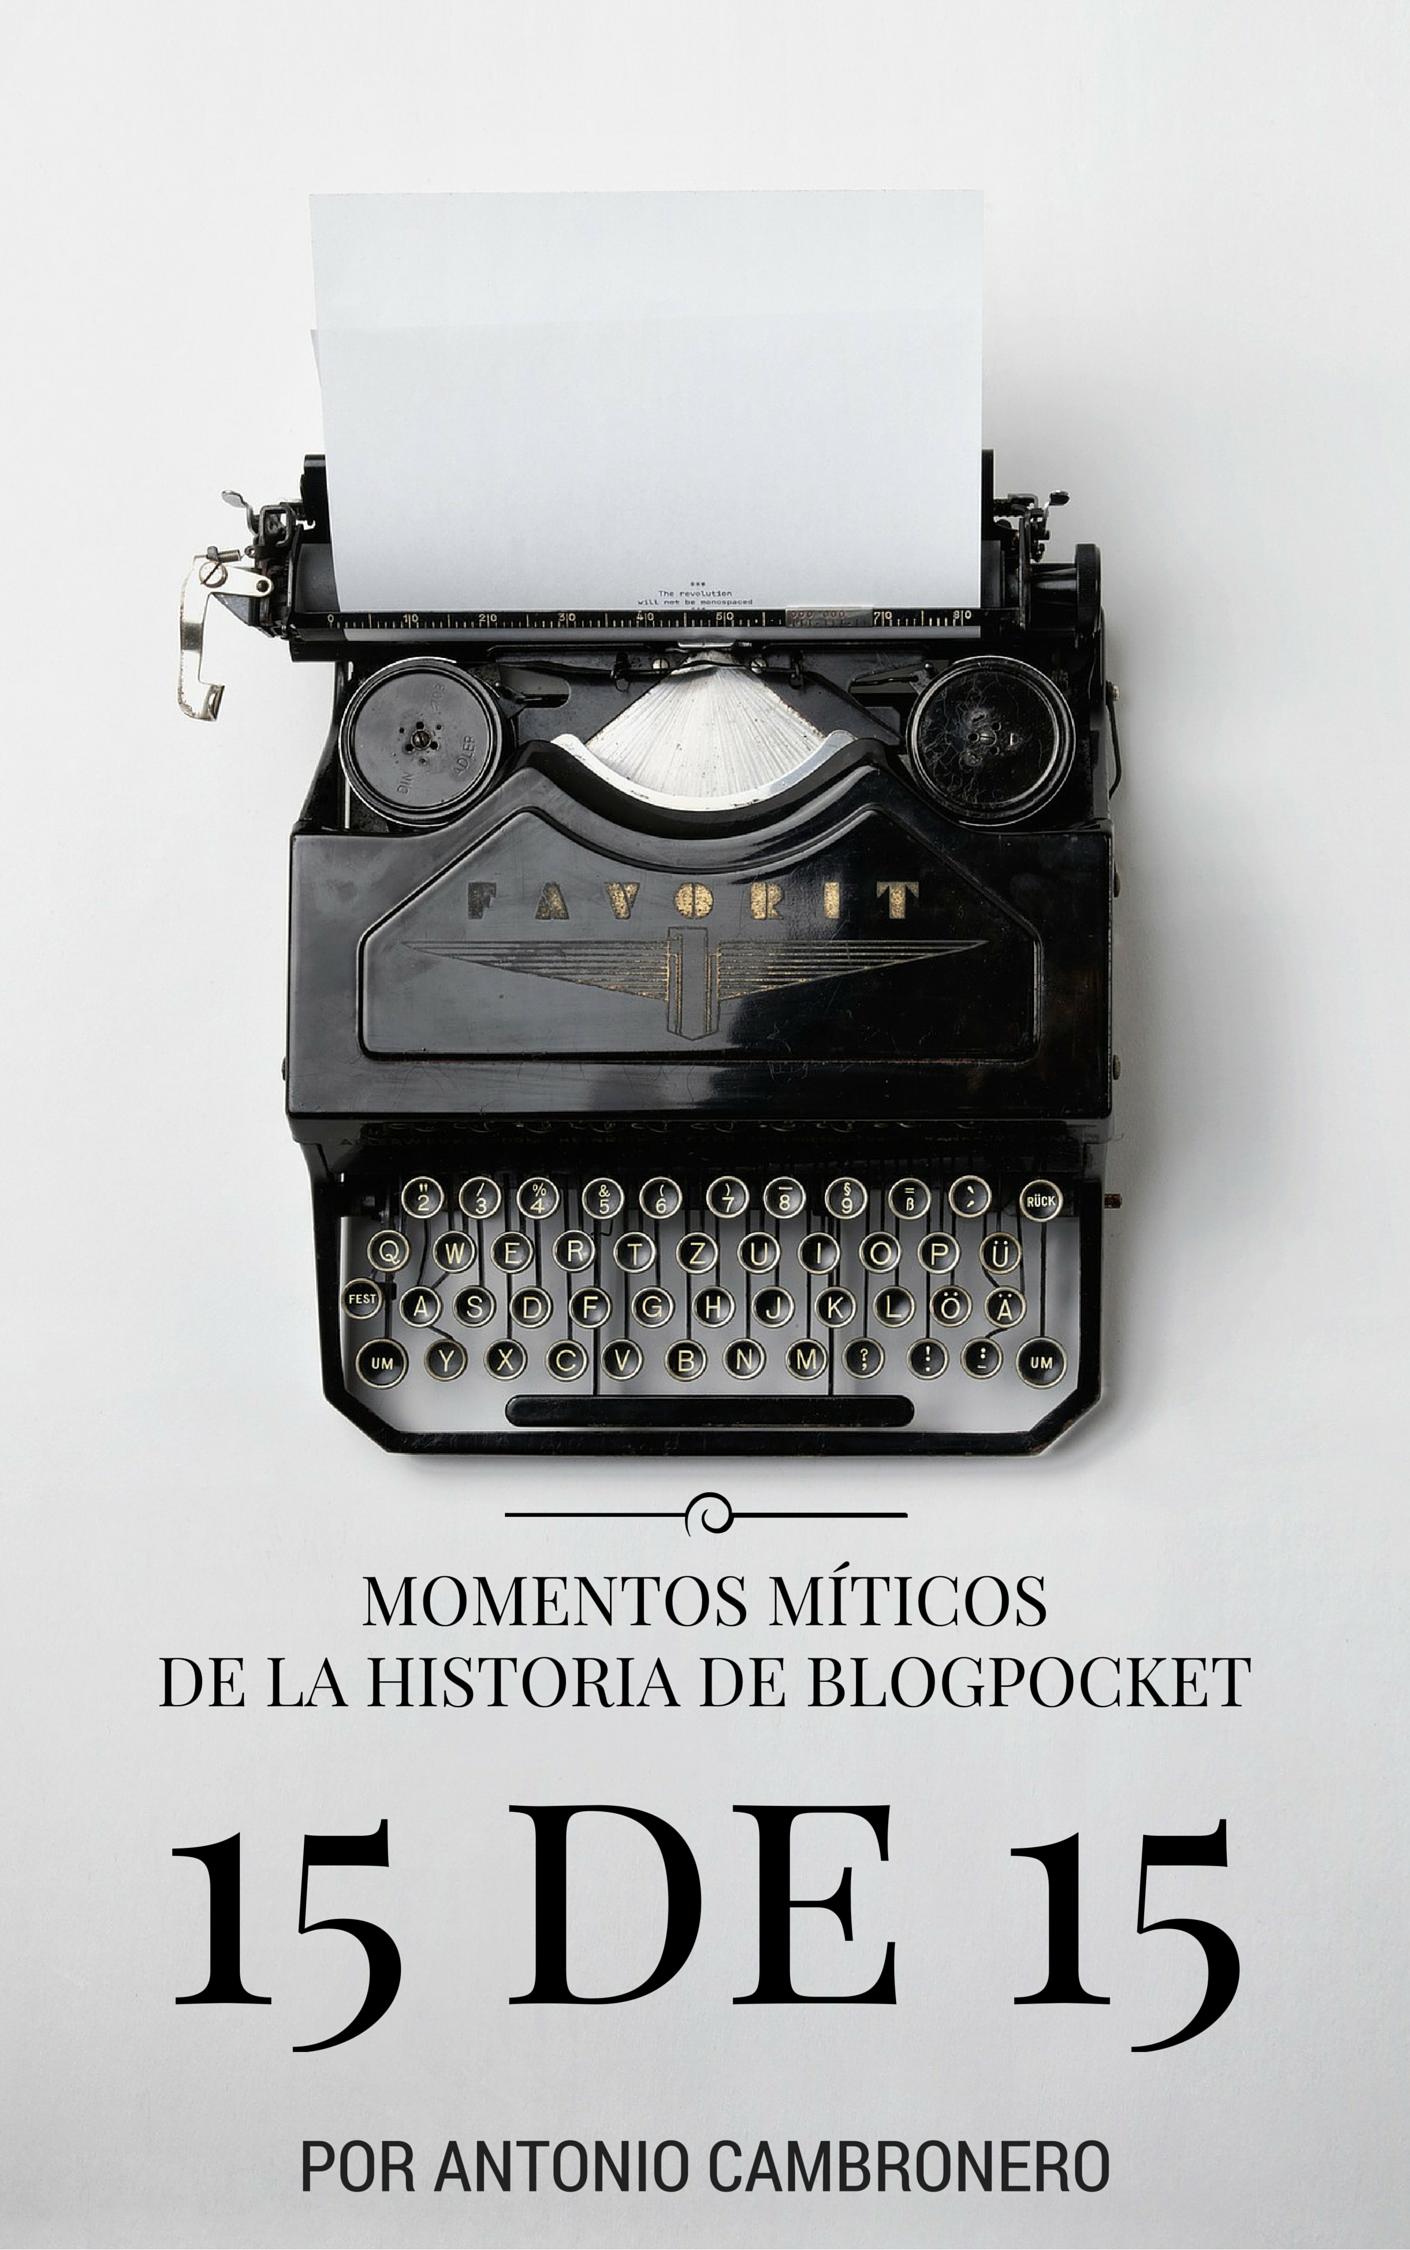 La verdadera historia de Blogpocket